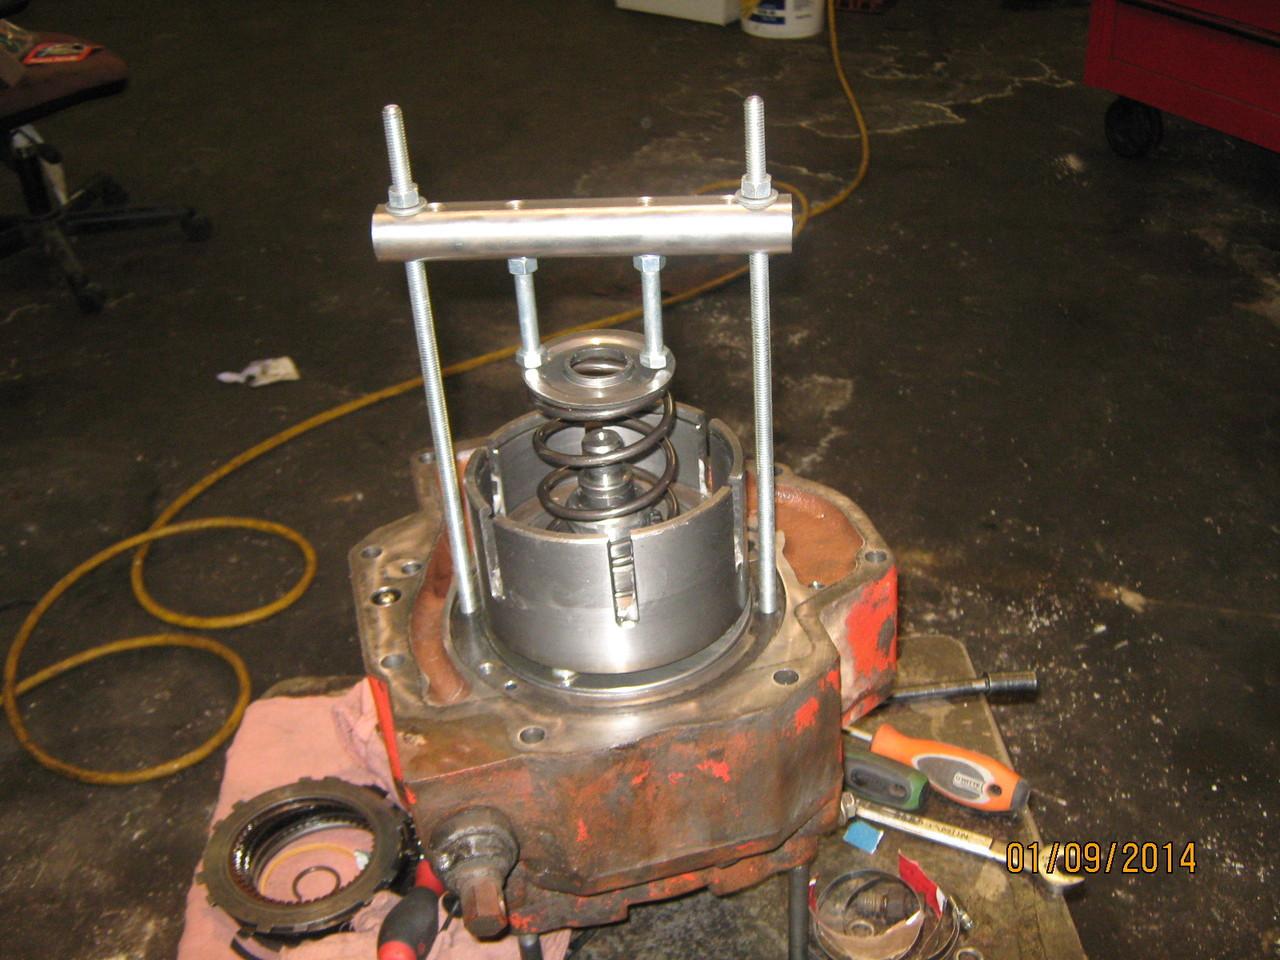 International Harvester Tractor Pto Diagram Car Wiring Diagrams Ih 1456 Clutch Tool 656 756 856 1206 1066 1086 Redrunrite Rh Com Cub Cadet Rear